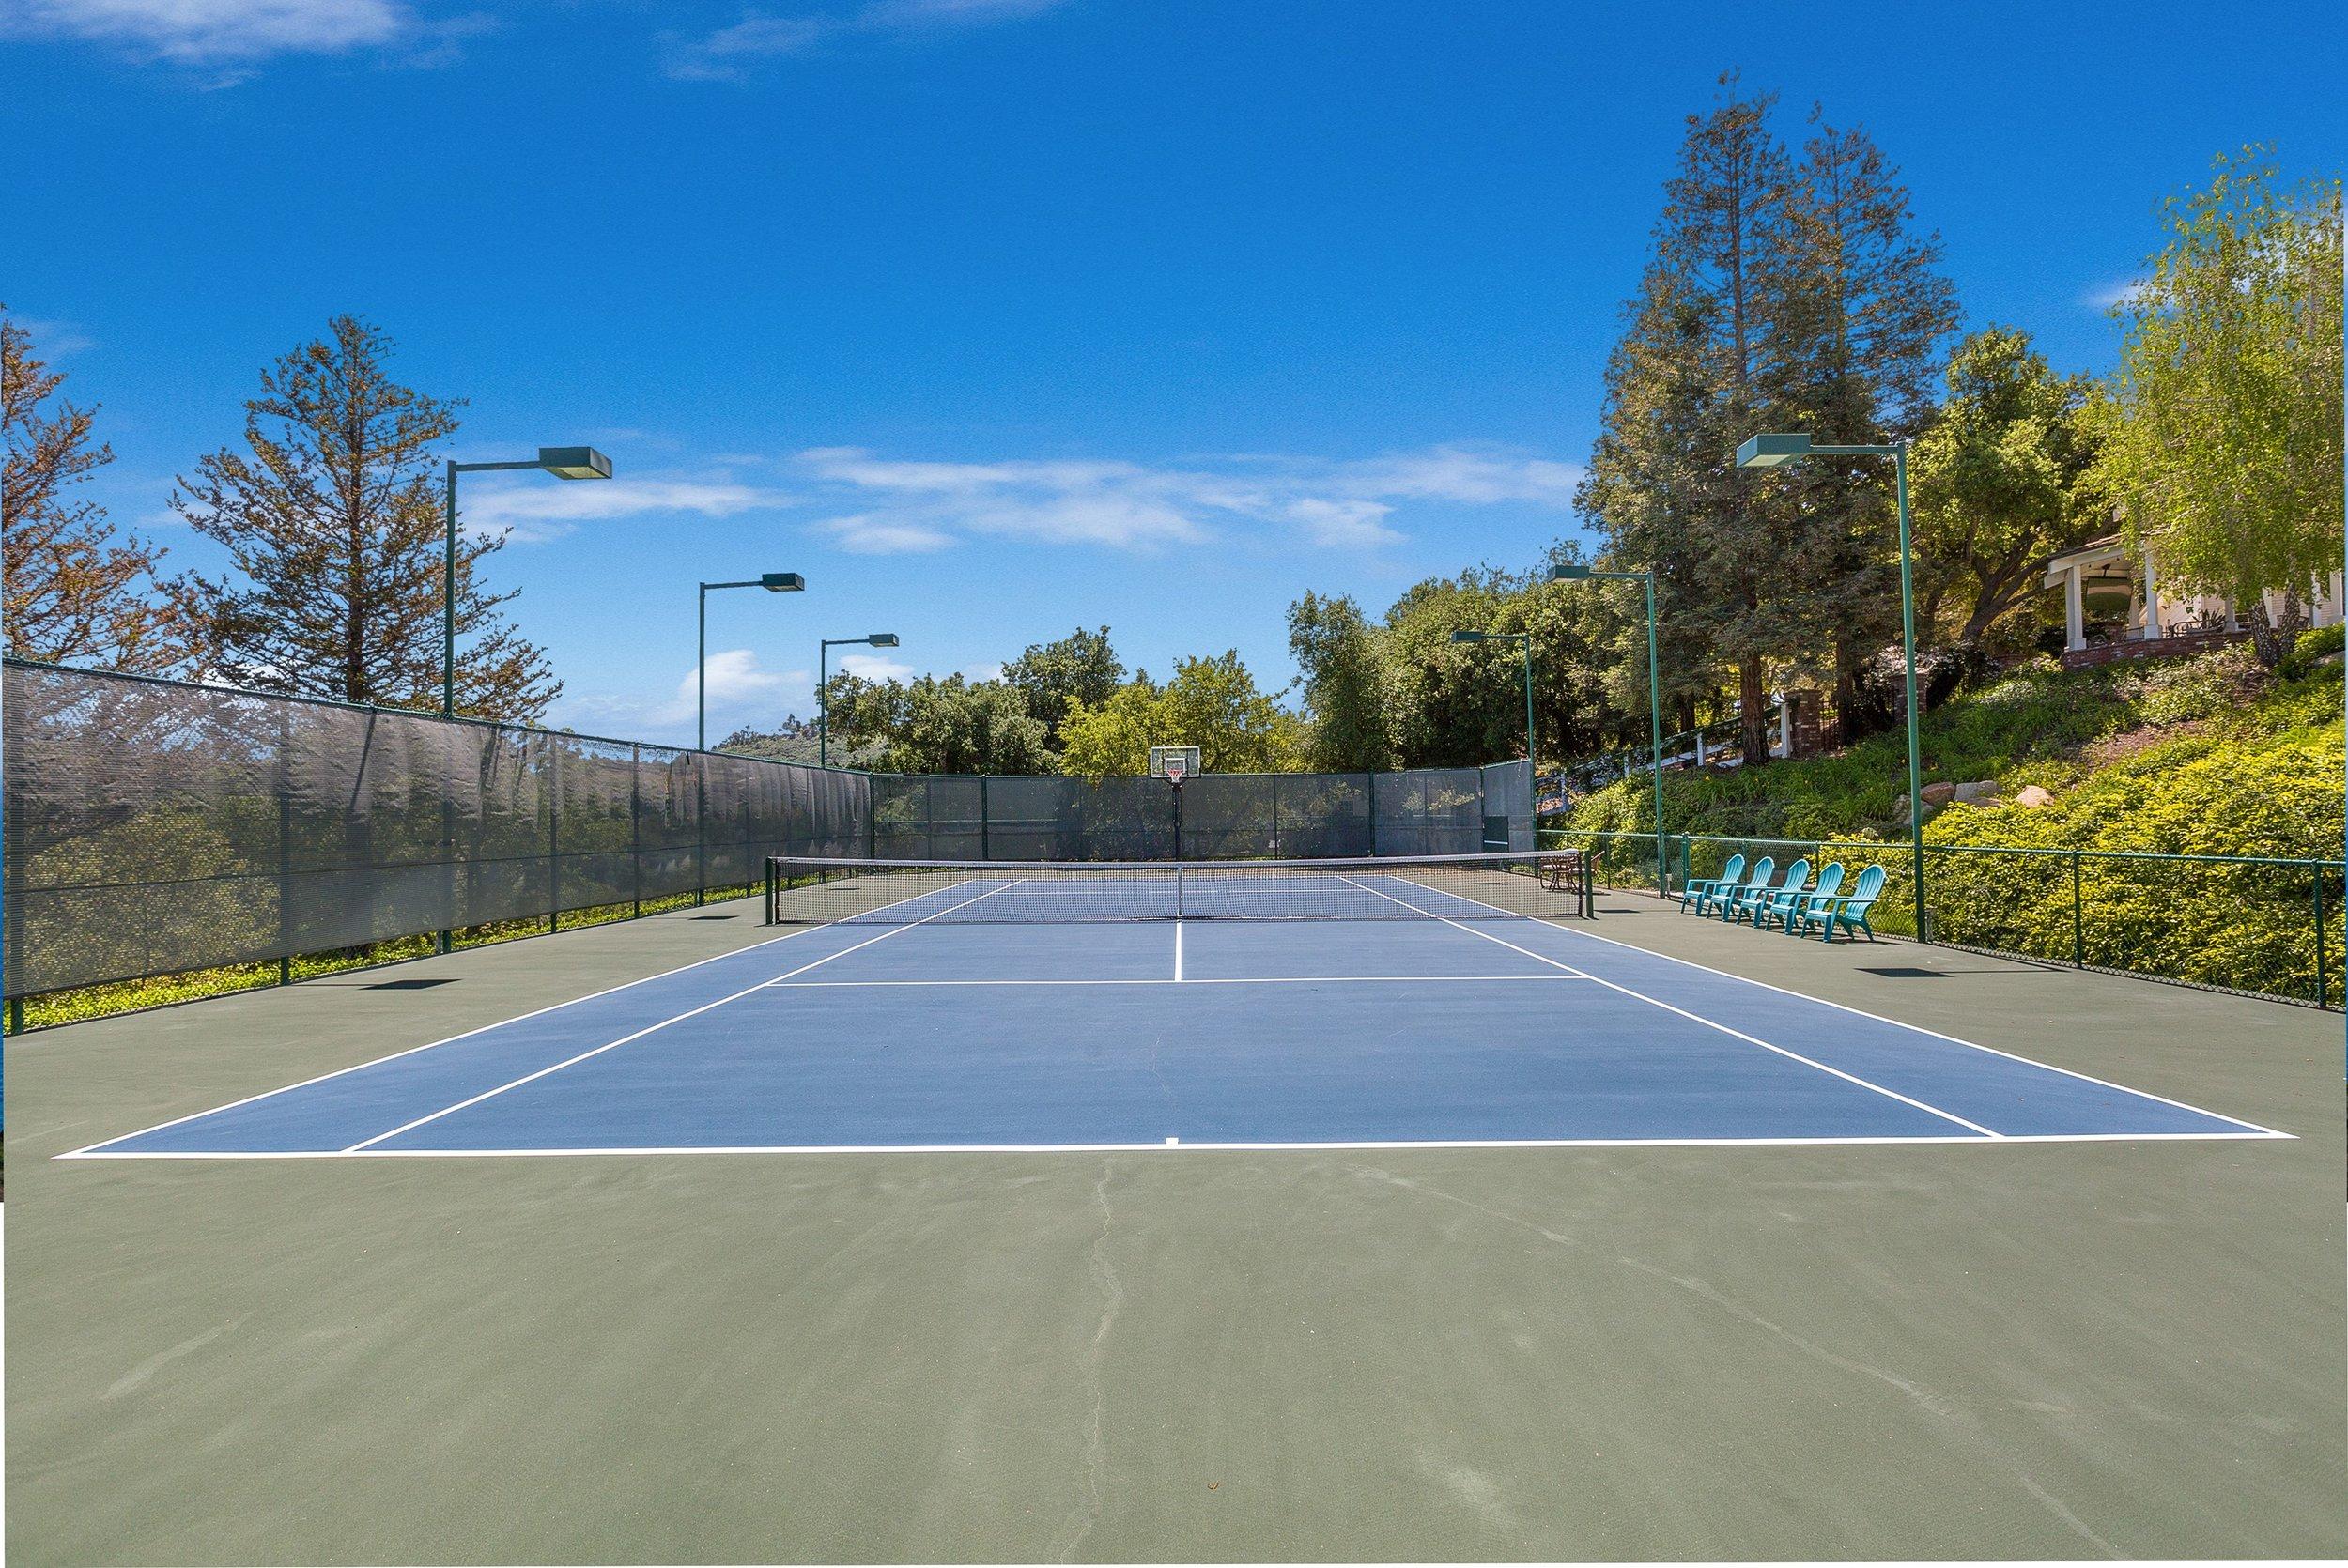 074_Tennis Court.jpg